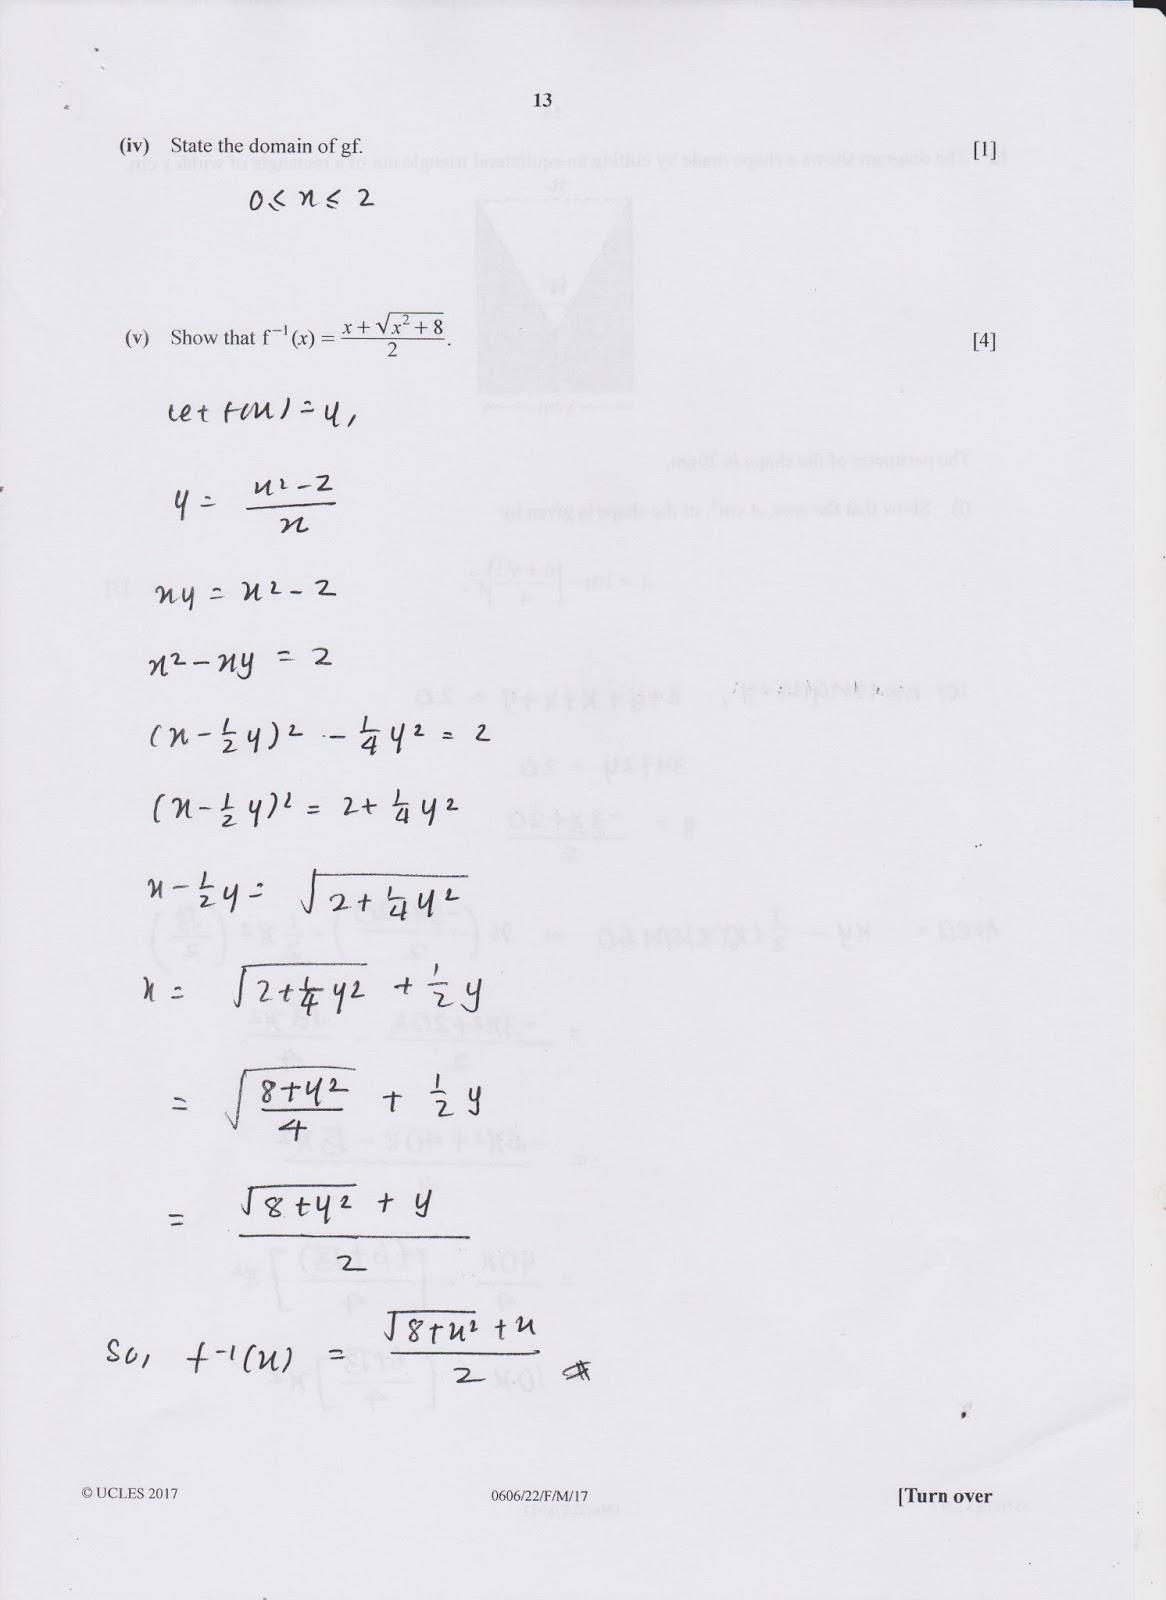 Add Maths Past Papers : CXC CSEC Maths Past Paper 2